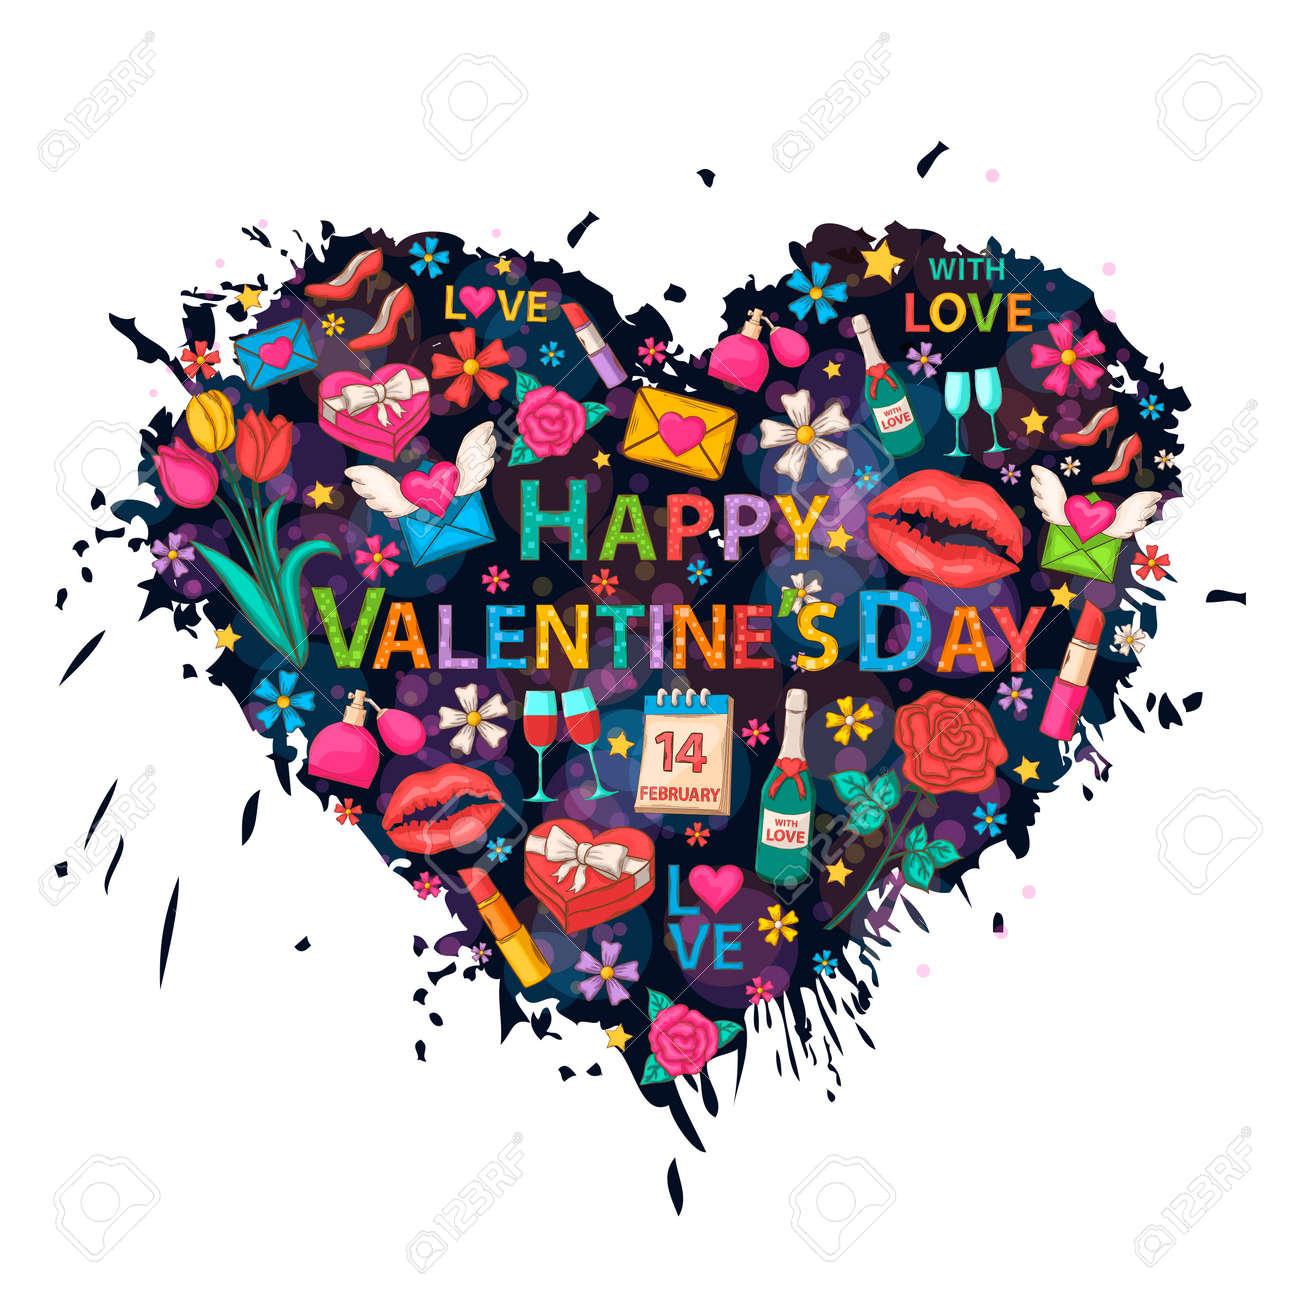 Happy Valentines Day Clip Art